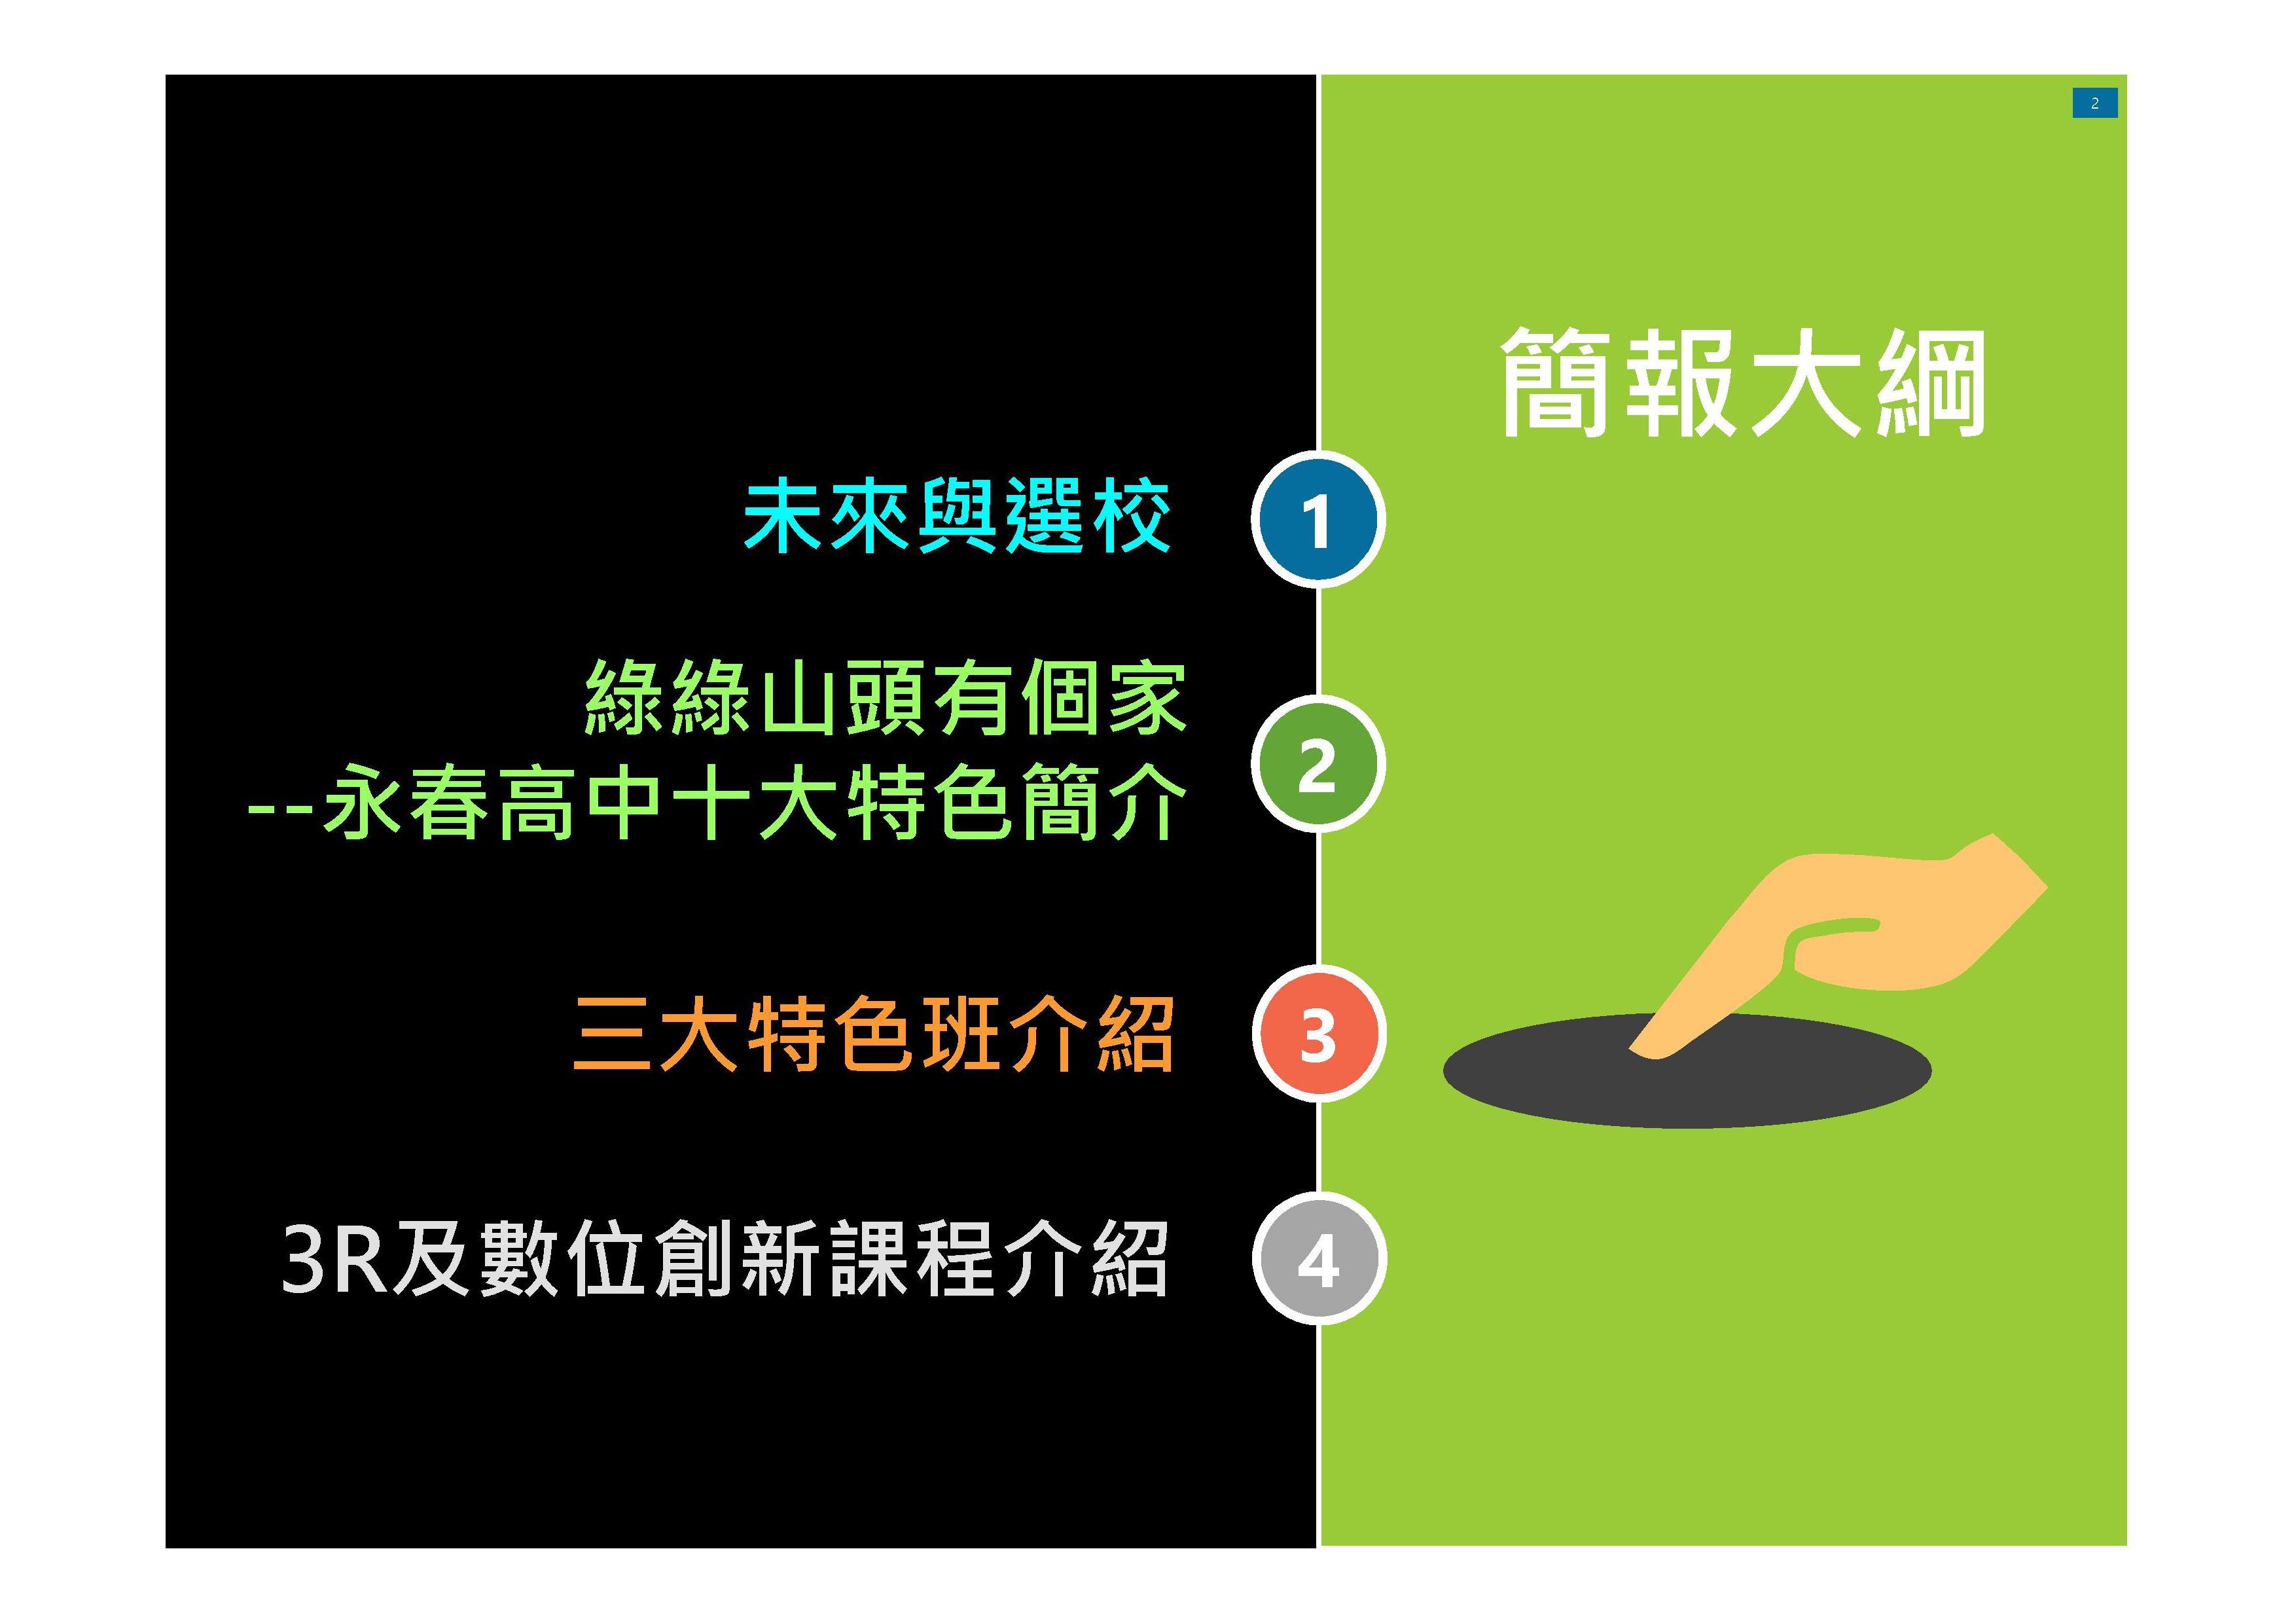 Microsoft PowerPoint - 永春高中簡介簡報10706100001